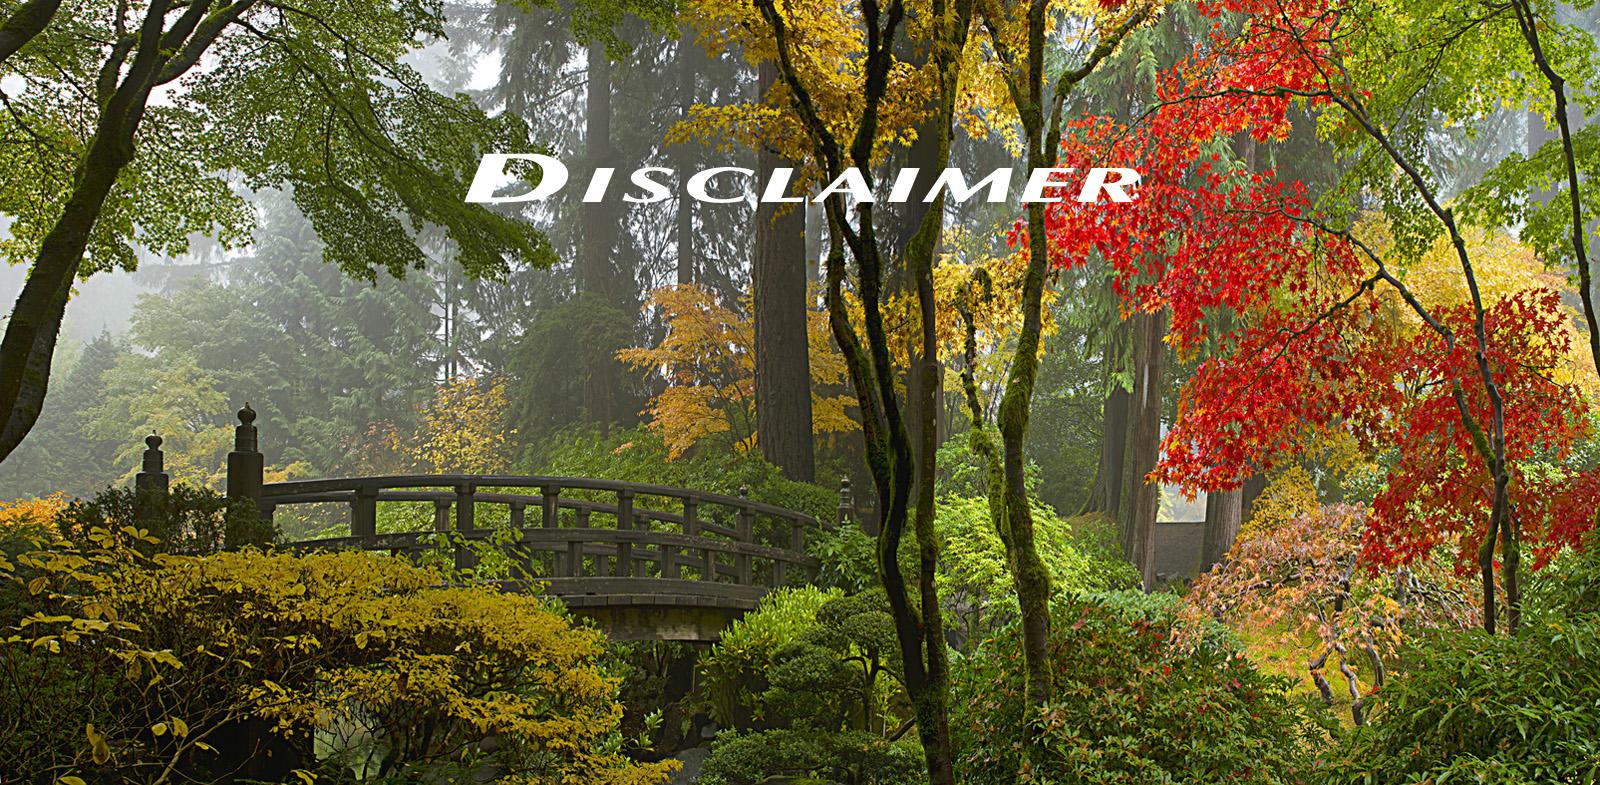 Website Disclaimer Photo, a wooden bridge at a Japanese garden